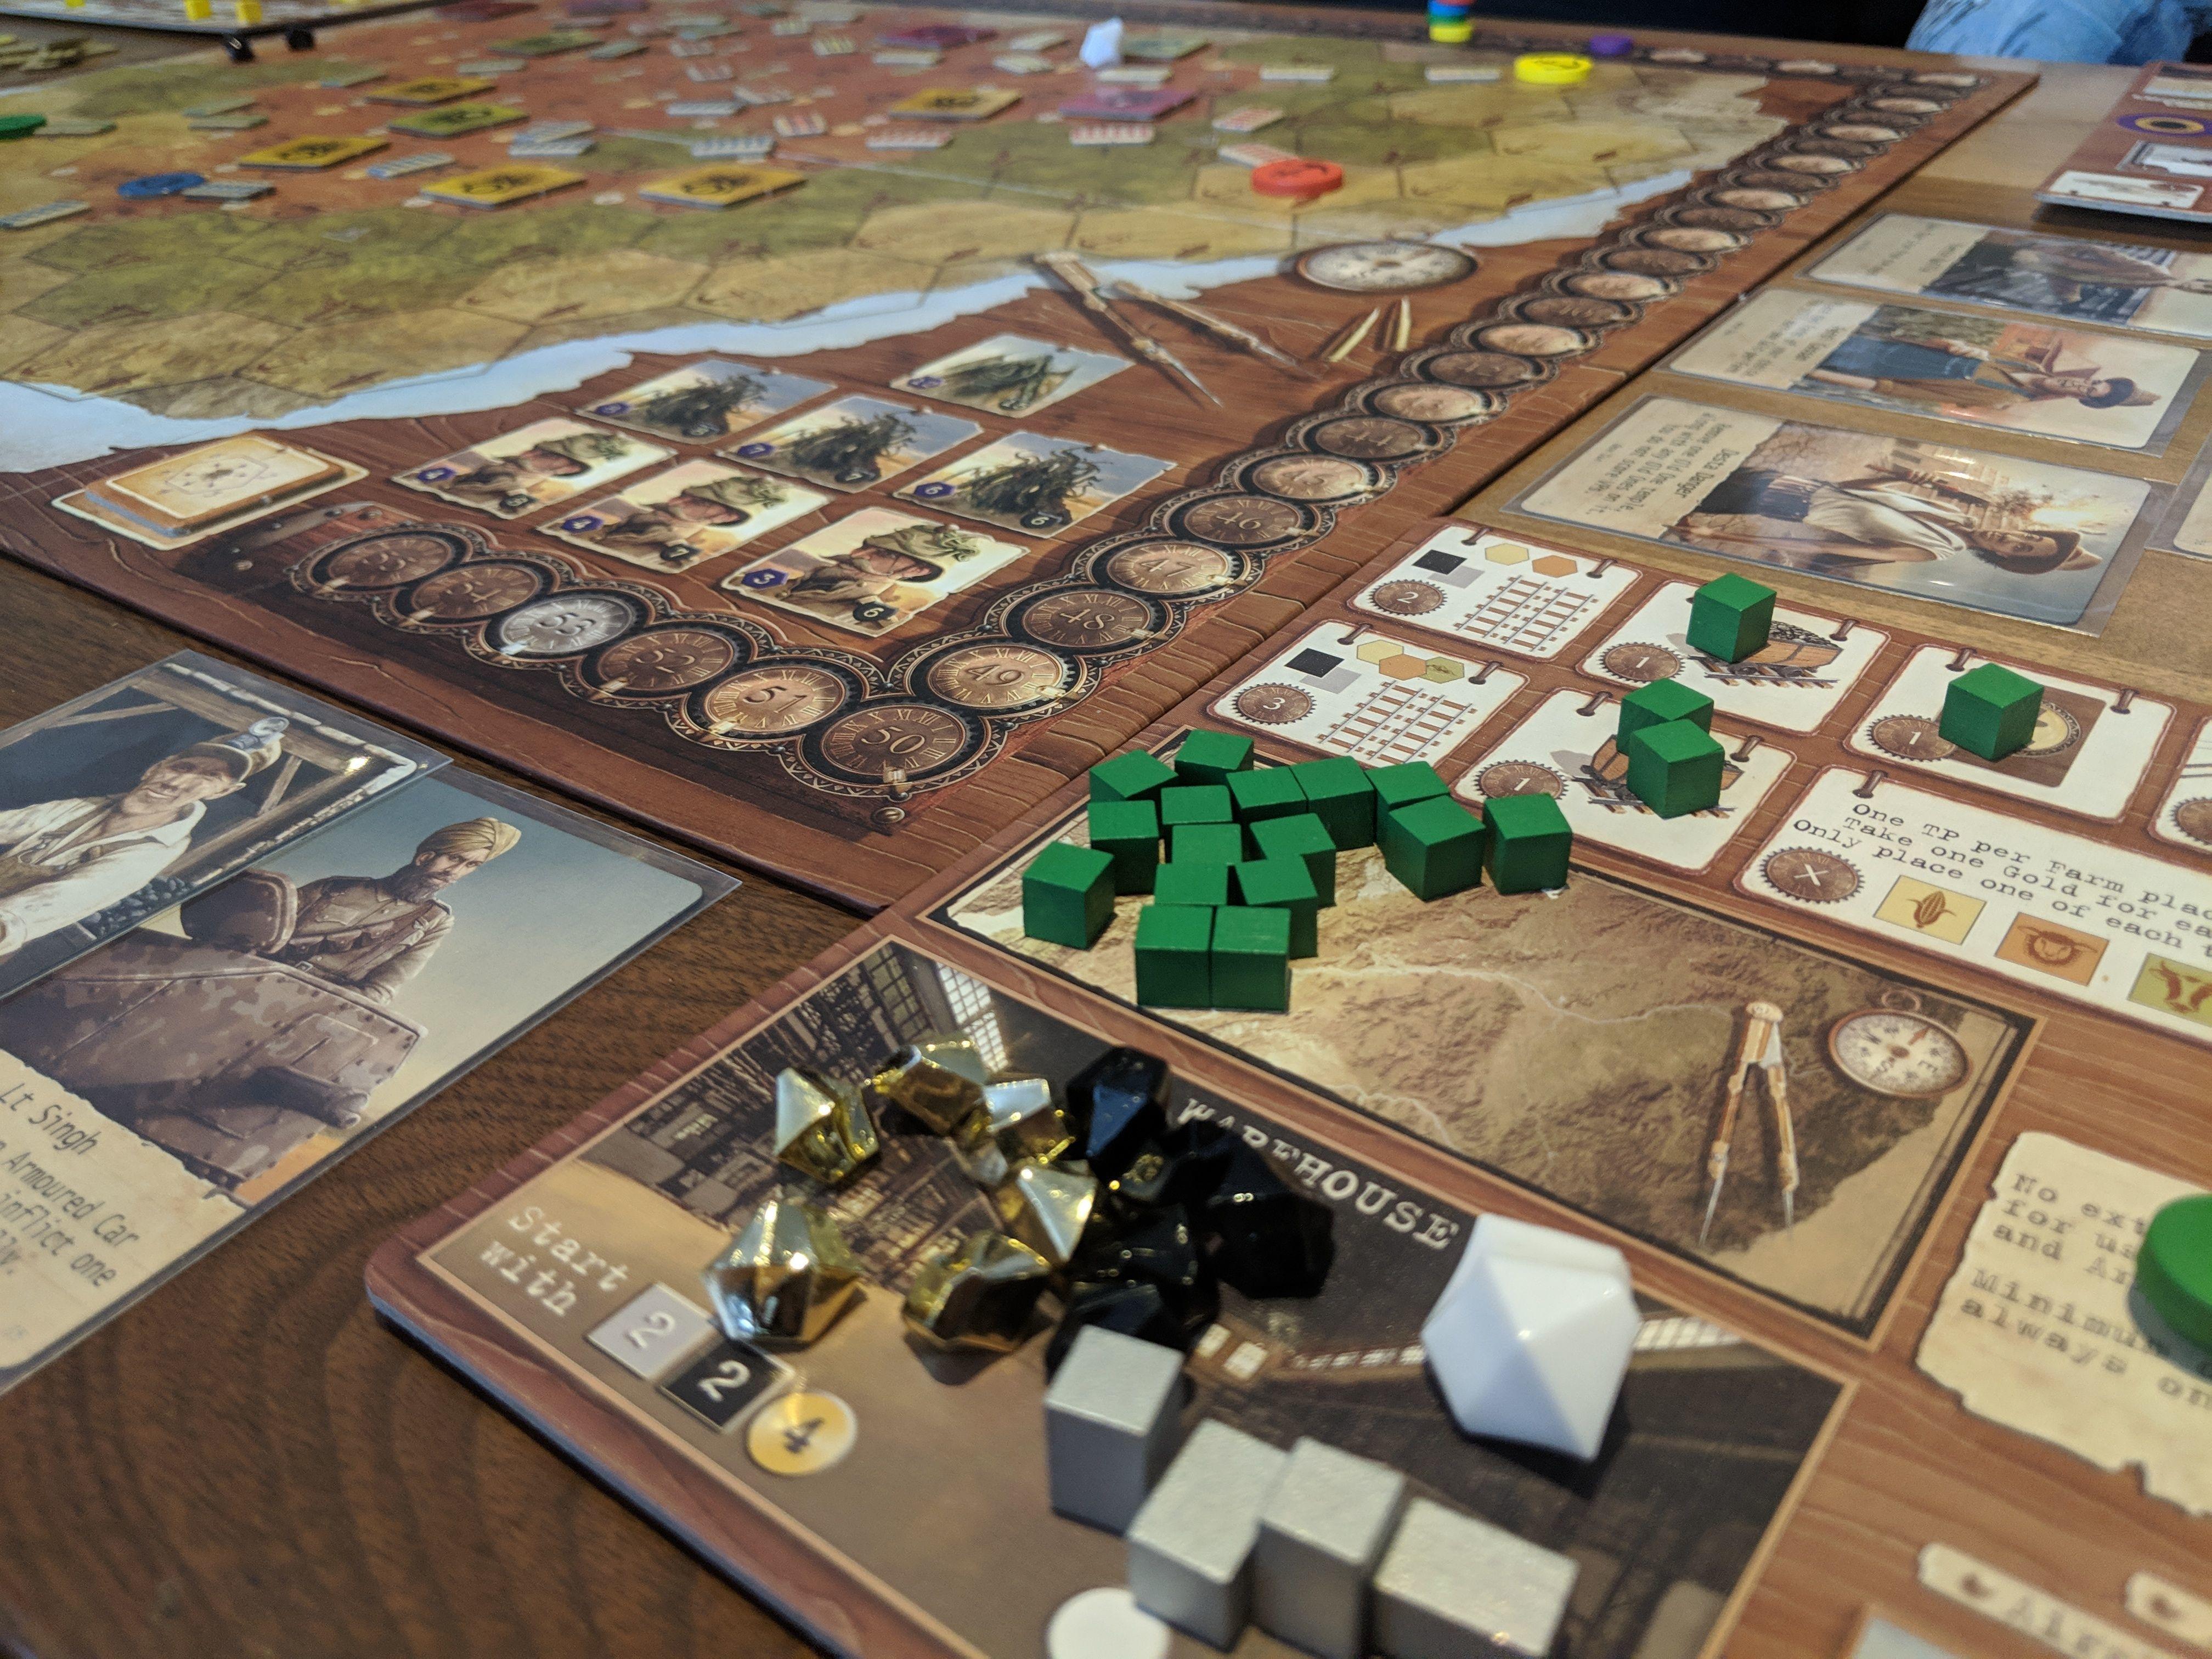 Come play board games about building Civiliza